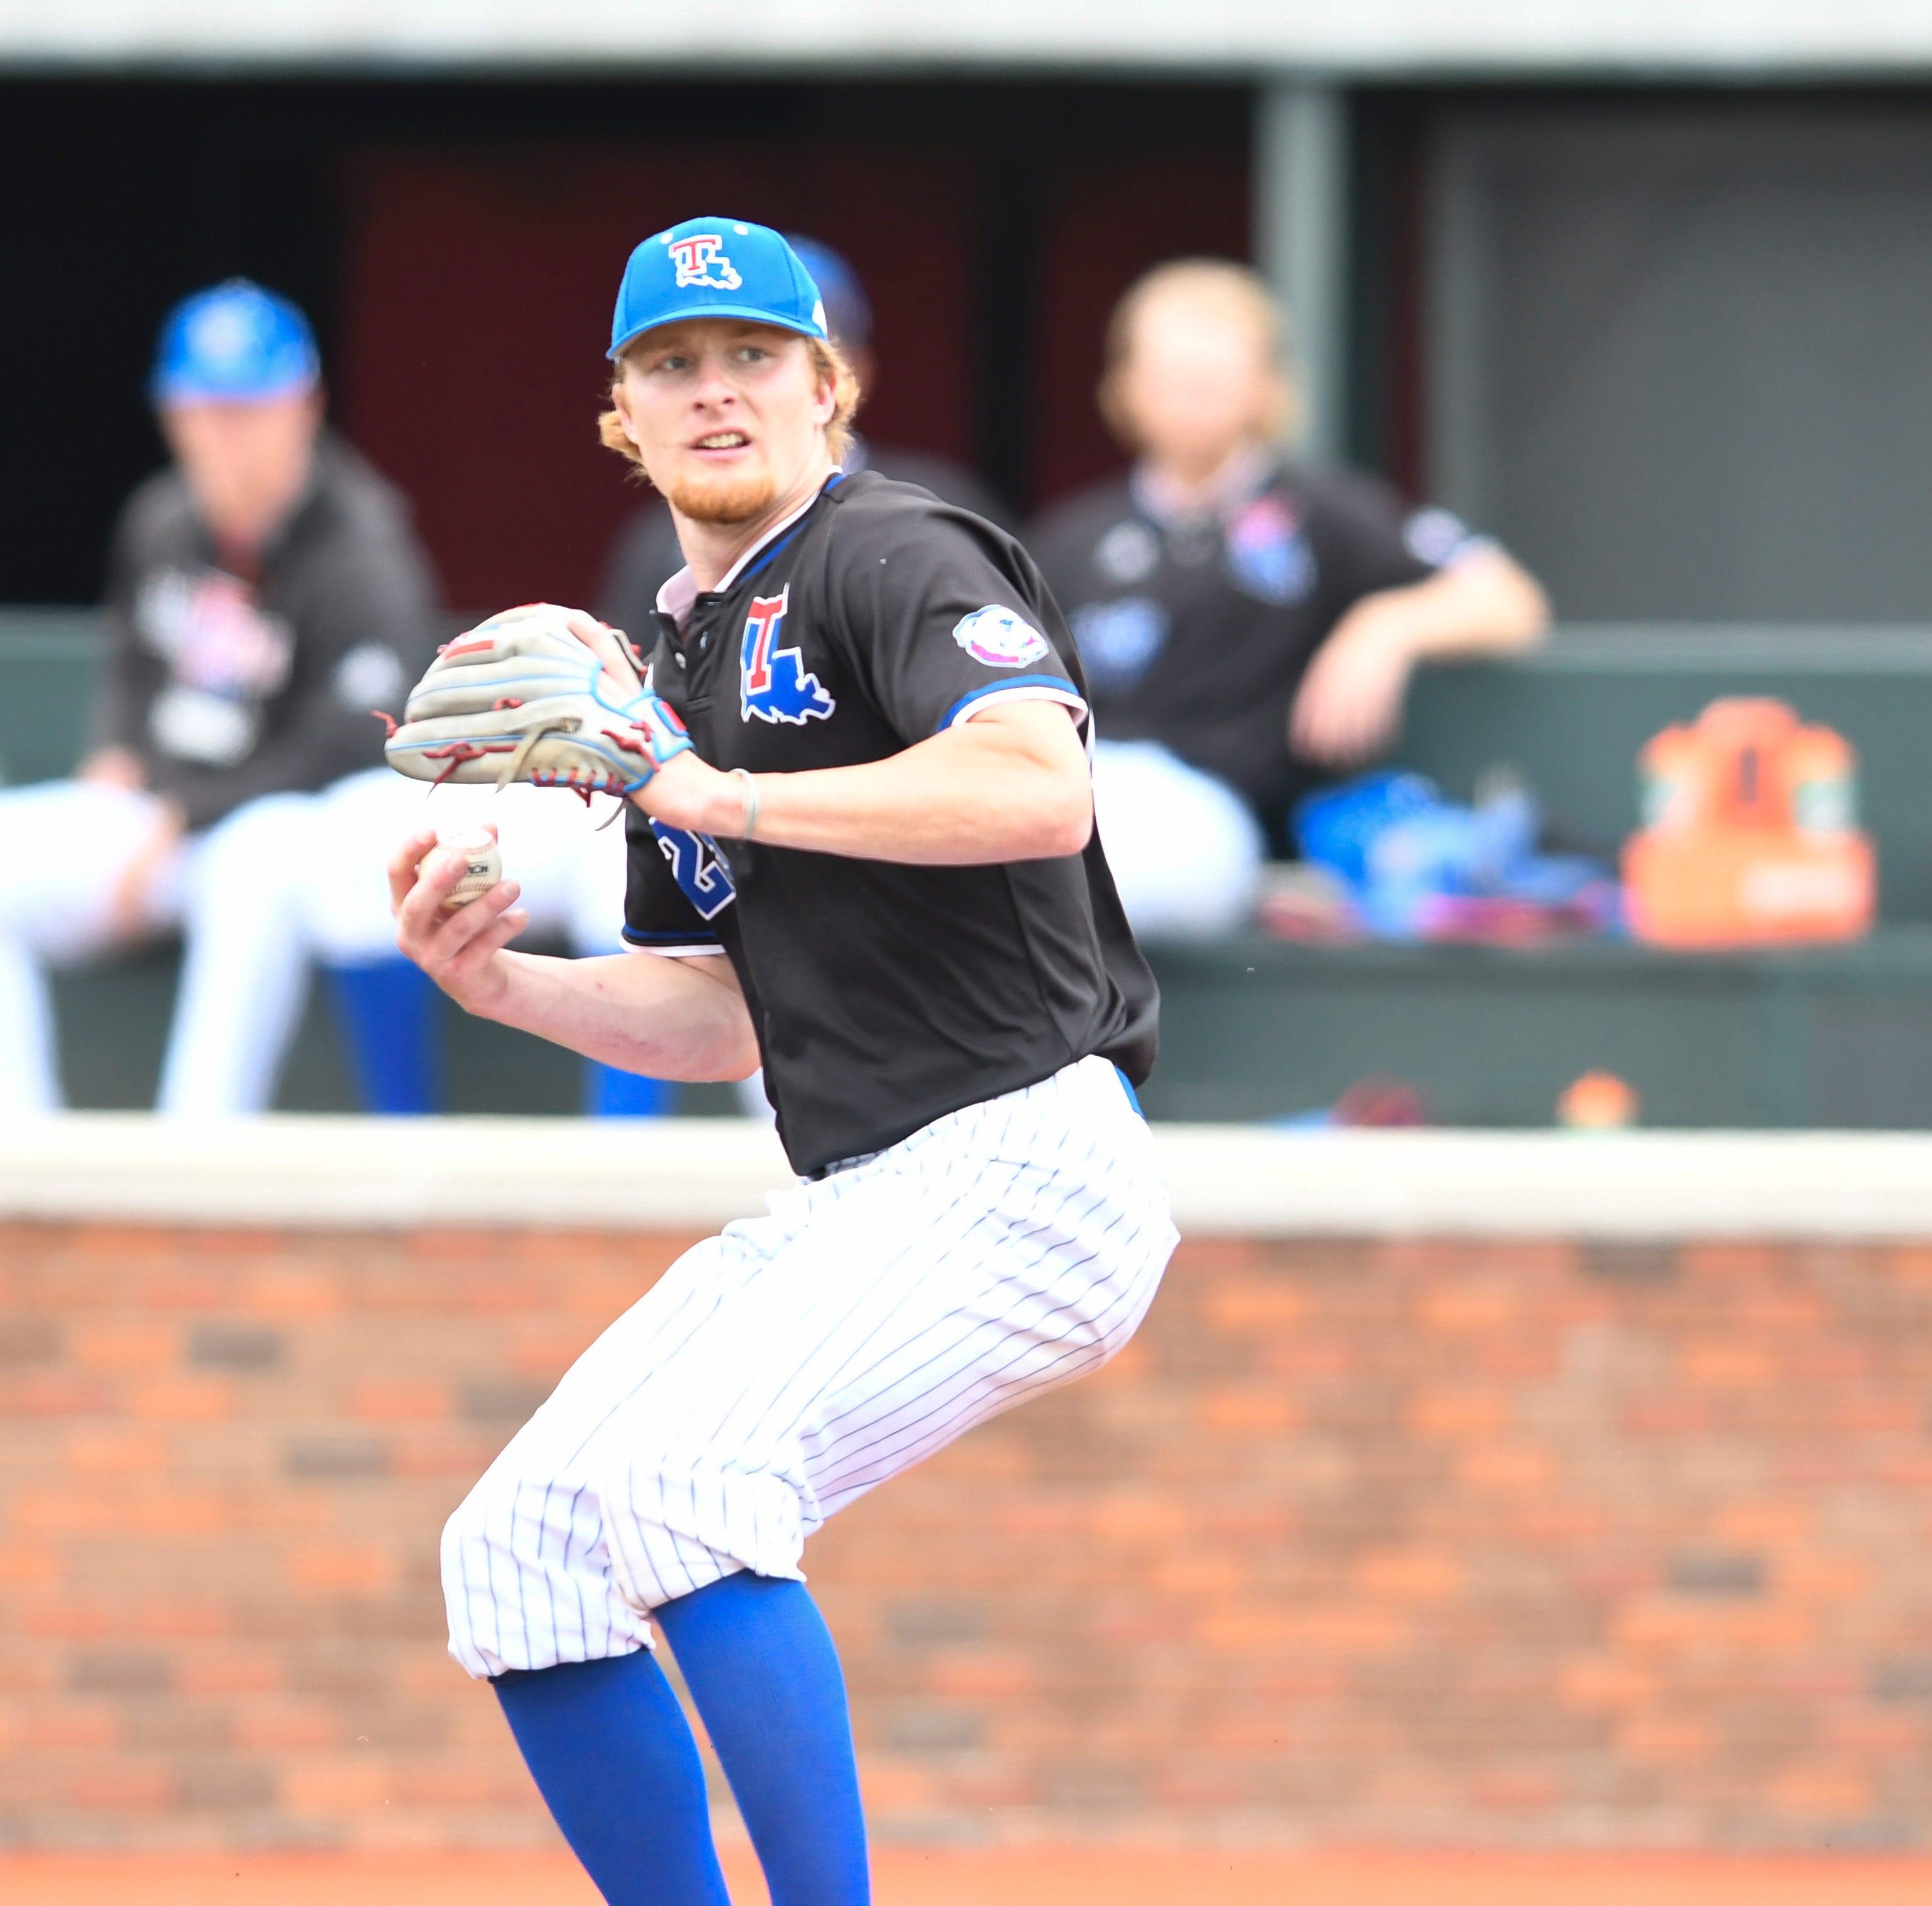 College roundup: Tech baseball sweeps ULL; LSU falls to Southern